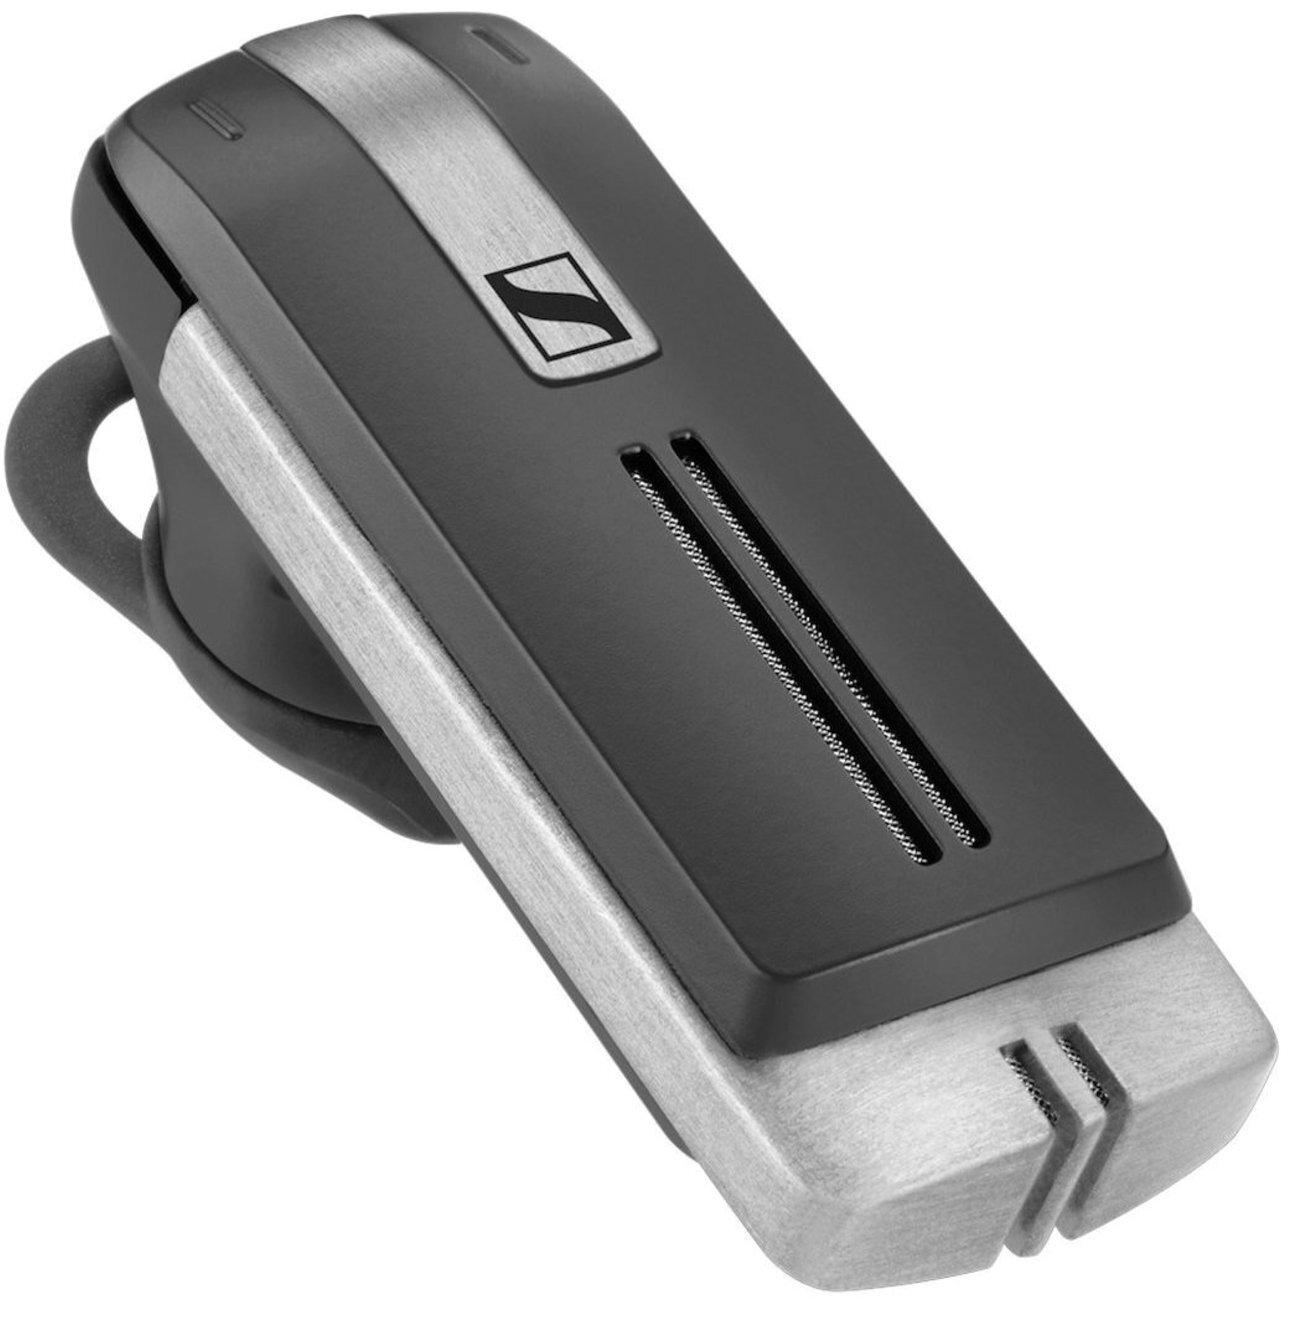 Bluetooth-гарнитура Sennheiser EPOS I Presence Business Wireless Grey (1000659) фото 1